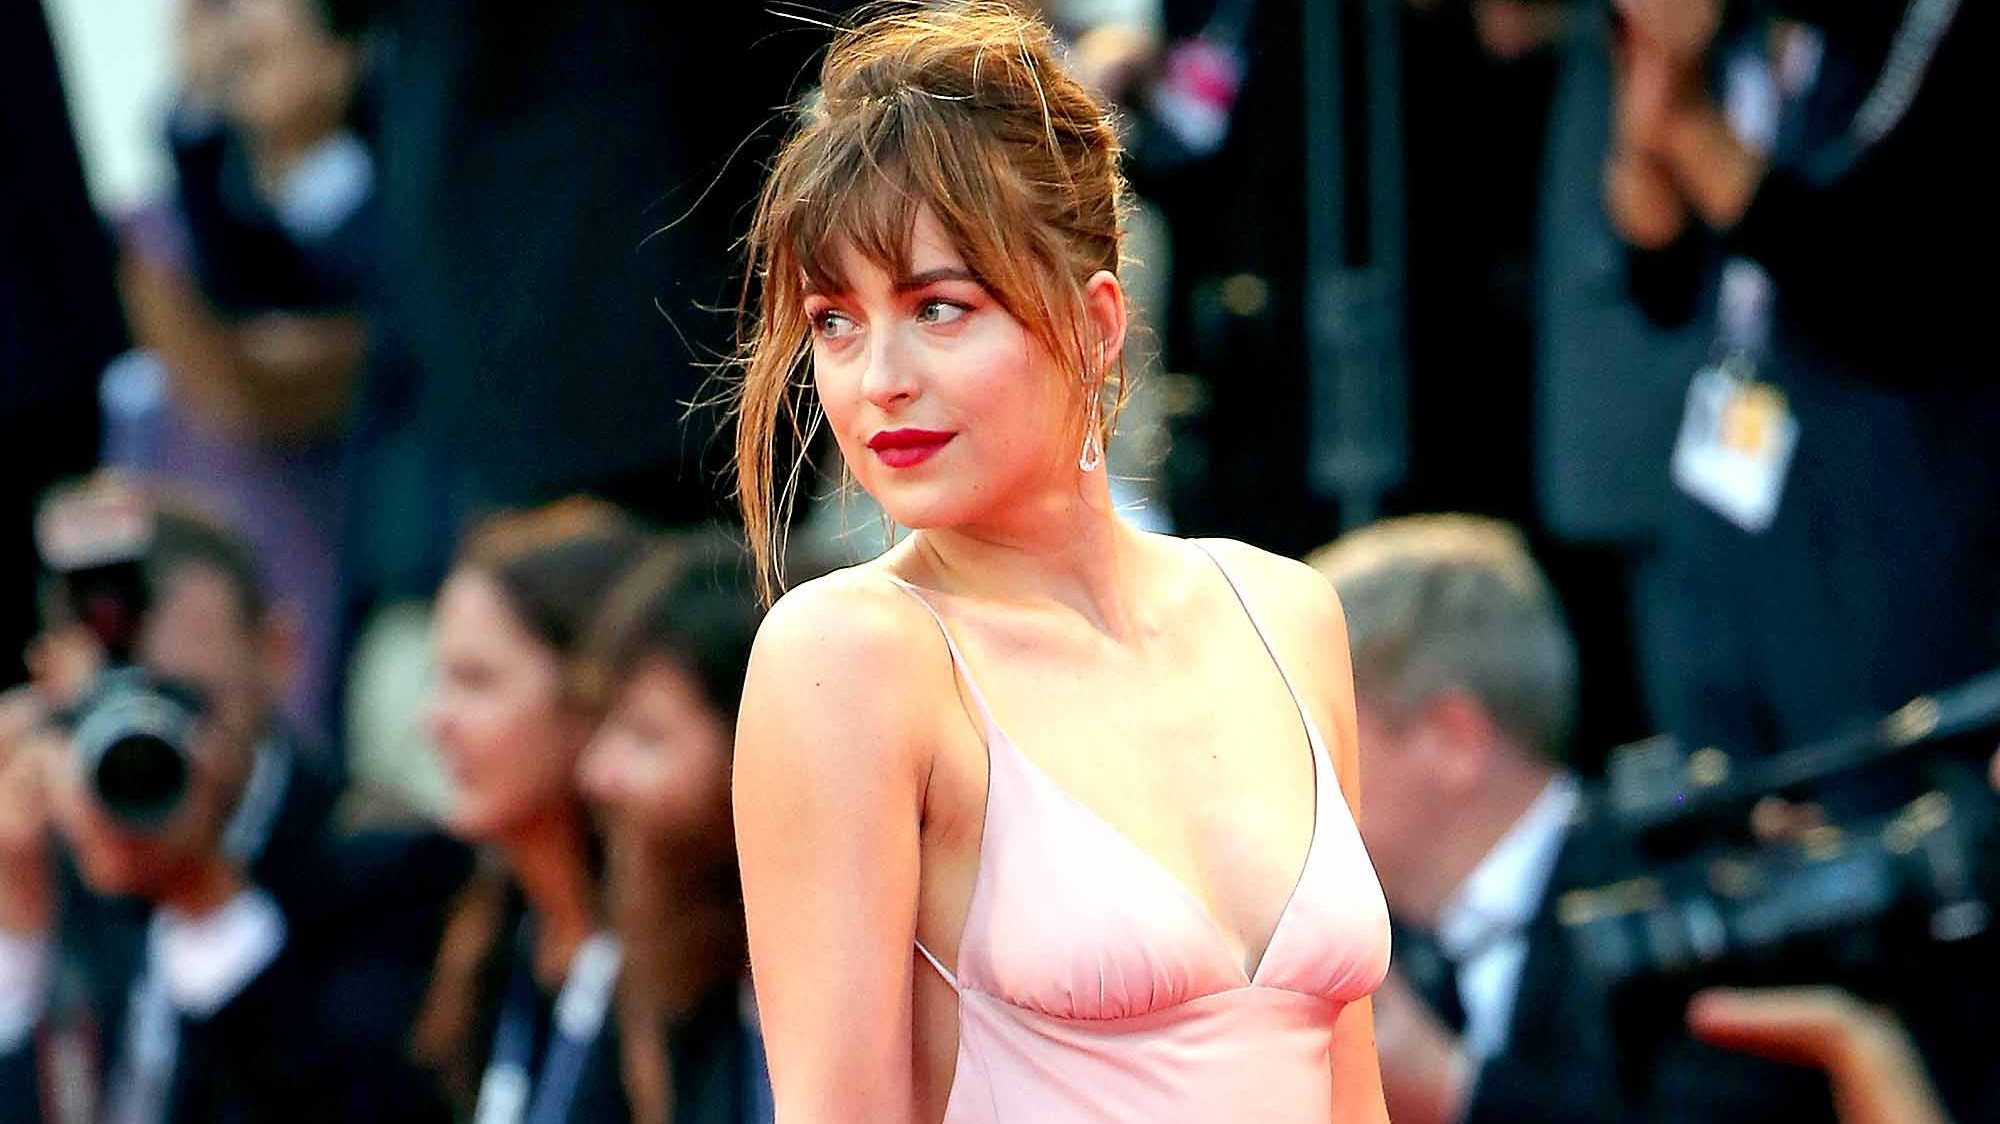 Dakota Johnson attends the premiere for 'Black Mass' during the 72nd Venice Film Festival on September 4, 2015 in Venice, Italy.